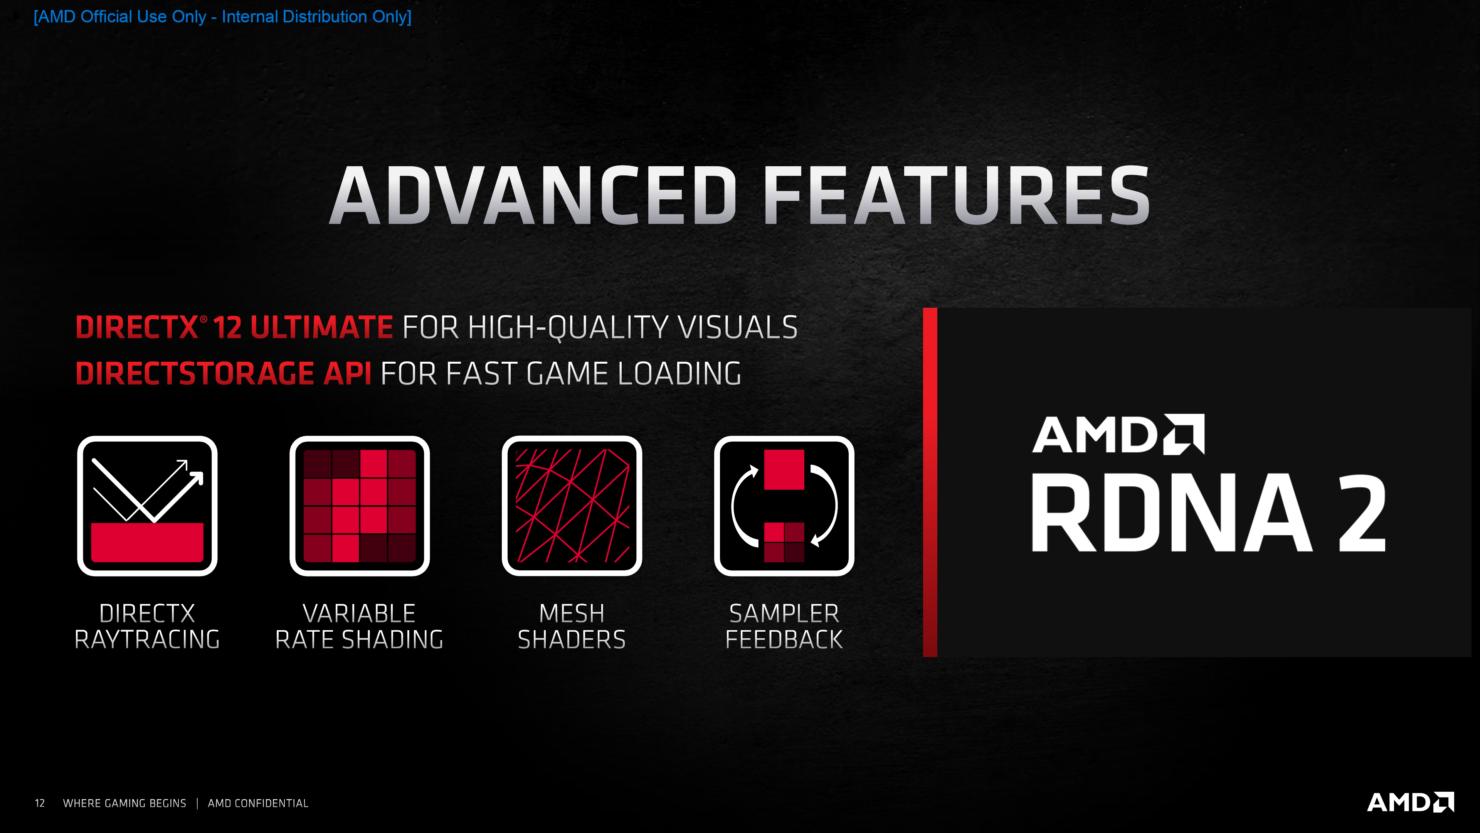 amd-radeon-rx-6000-series-graphics-cards_rdna-2-big-navi-gpu-architecture_9